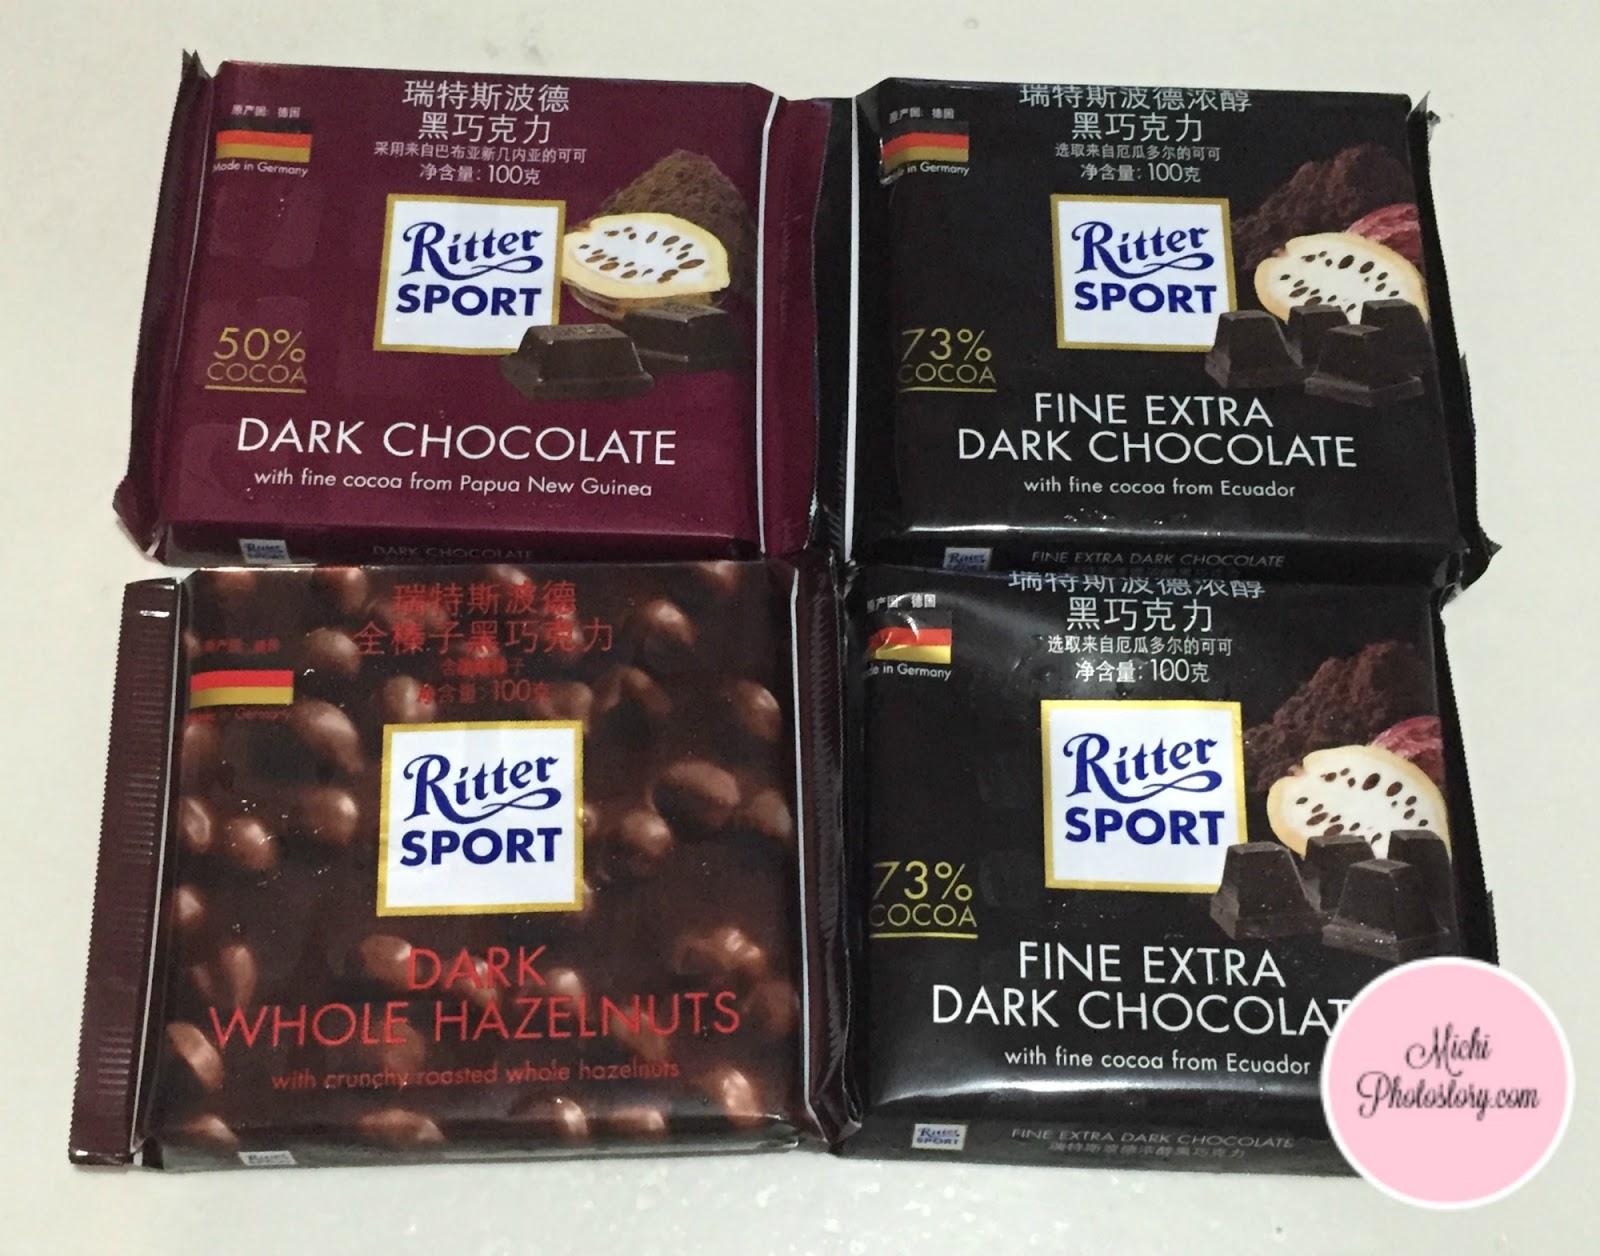 Michi Photostory: Ritter Sport Chocolate